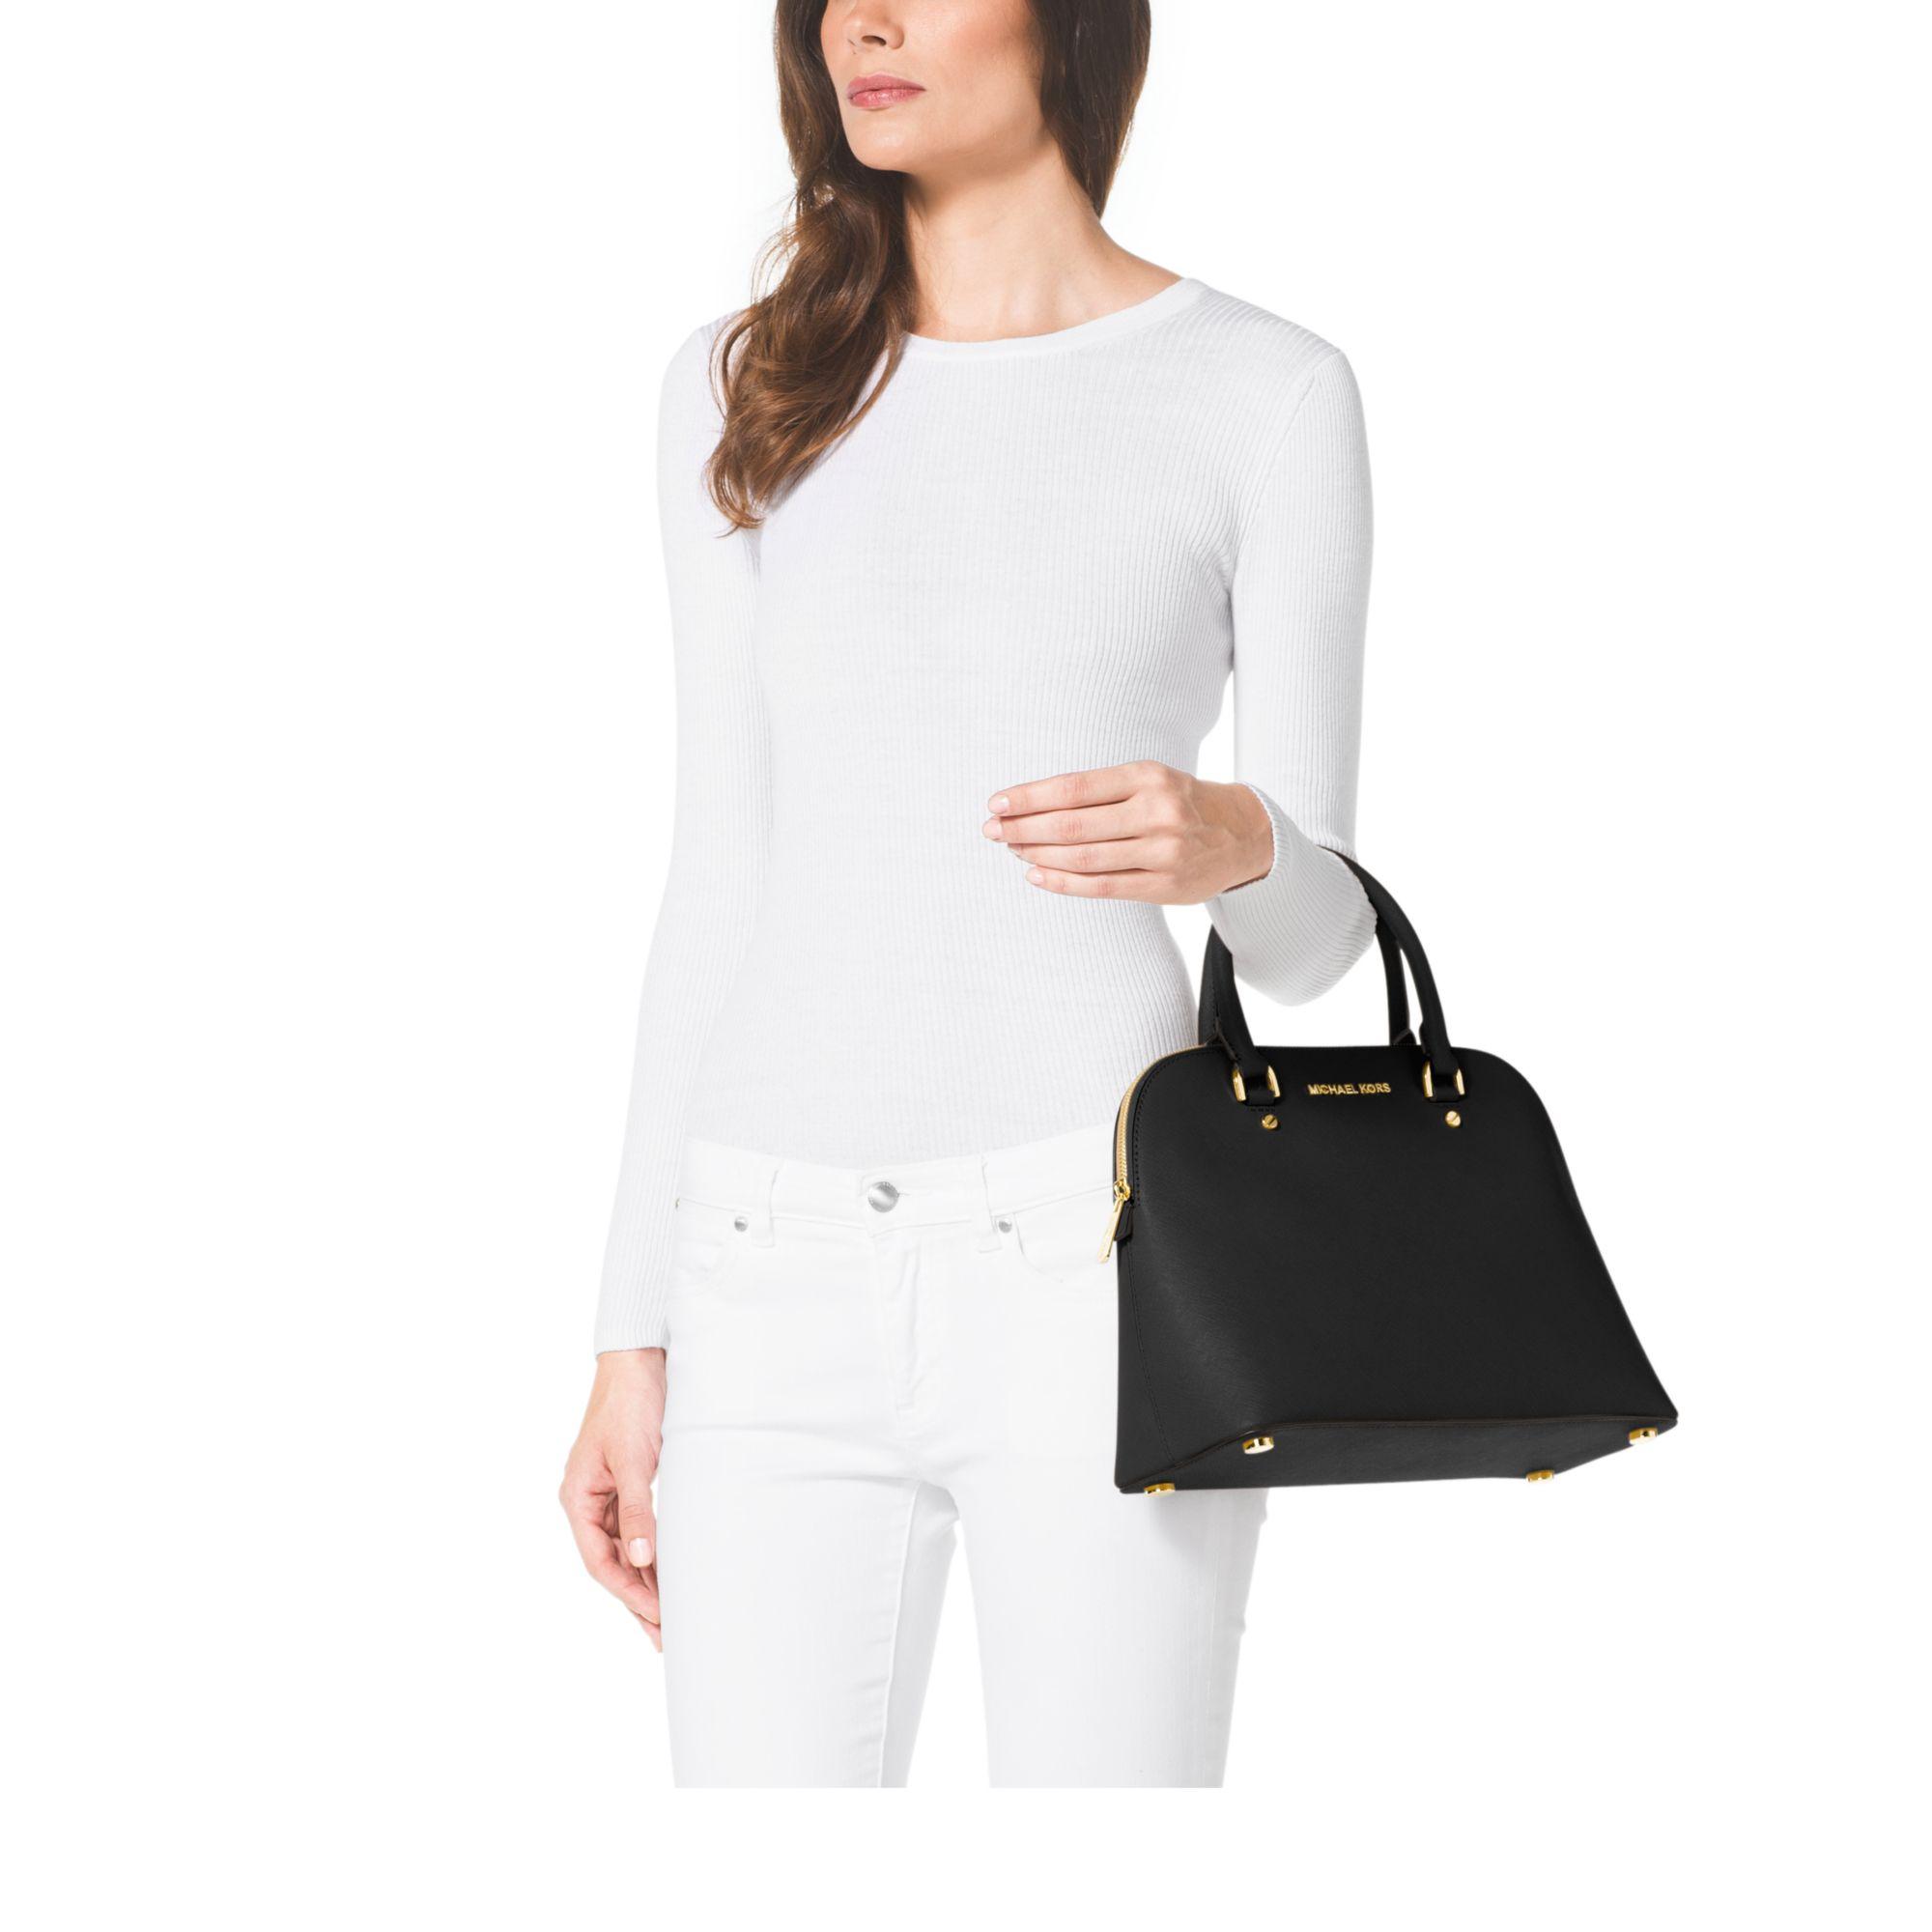 Michael Kors Cindy Laukku : Michael kors cindy large saffiano leather satchel in black